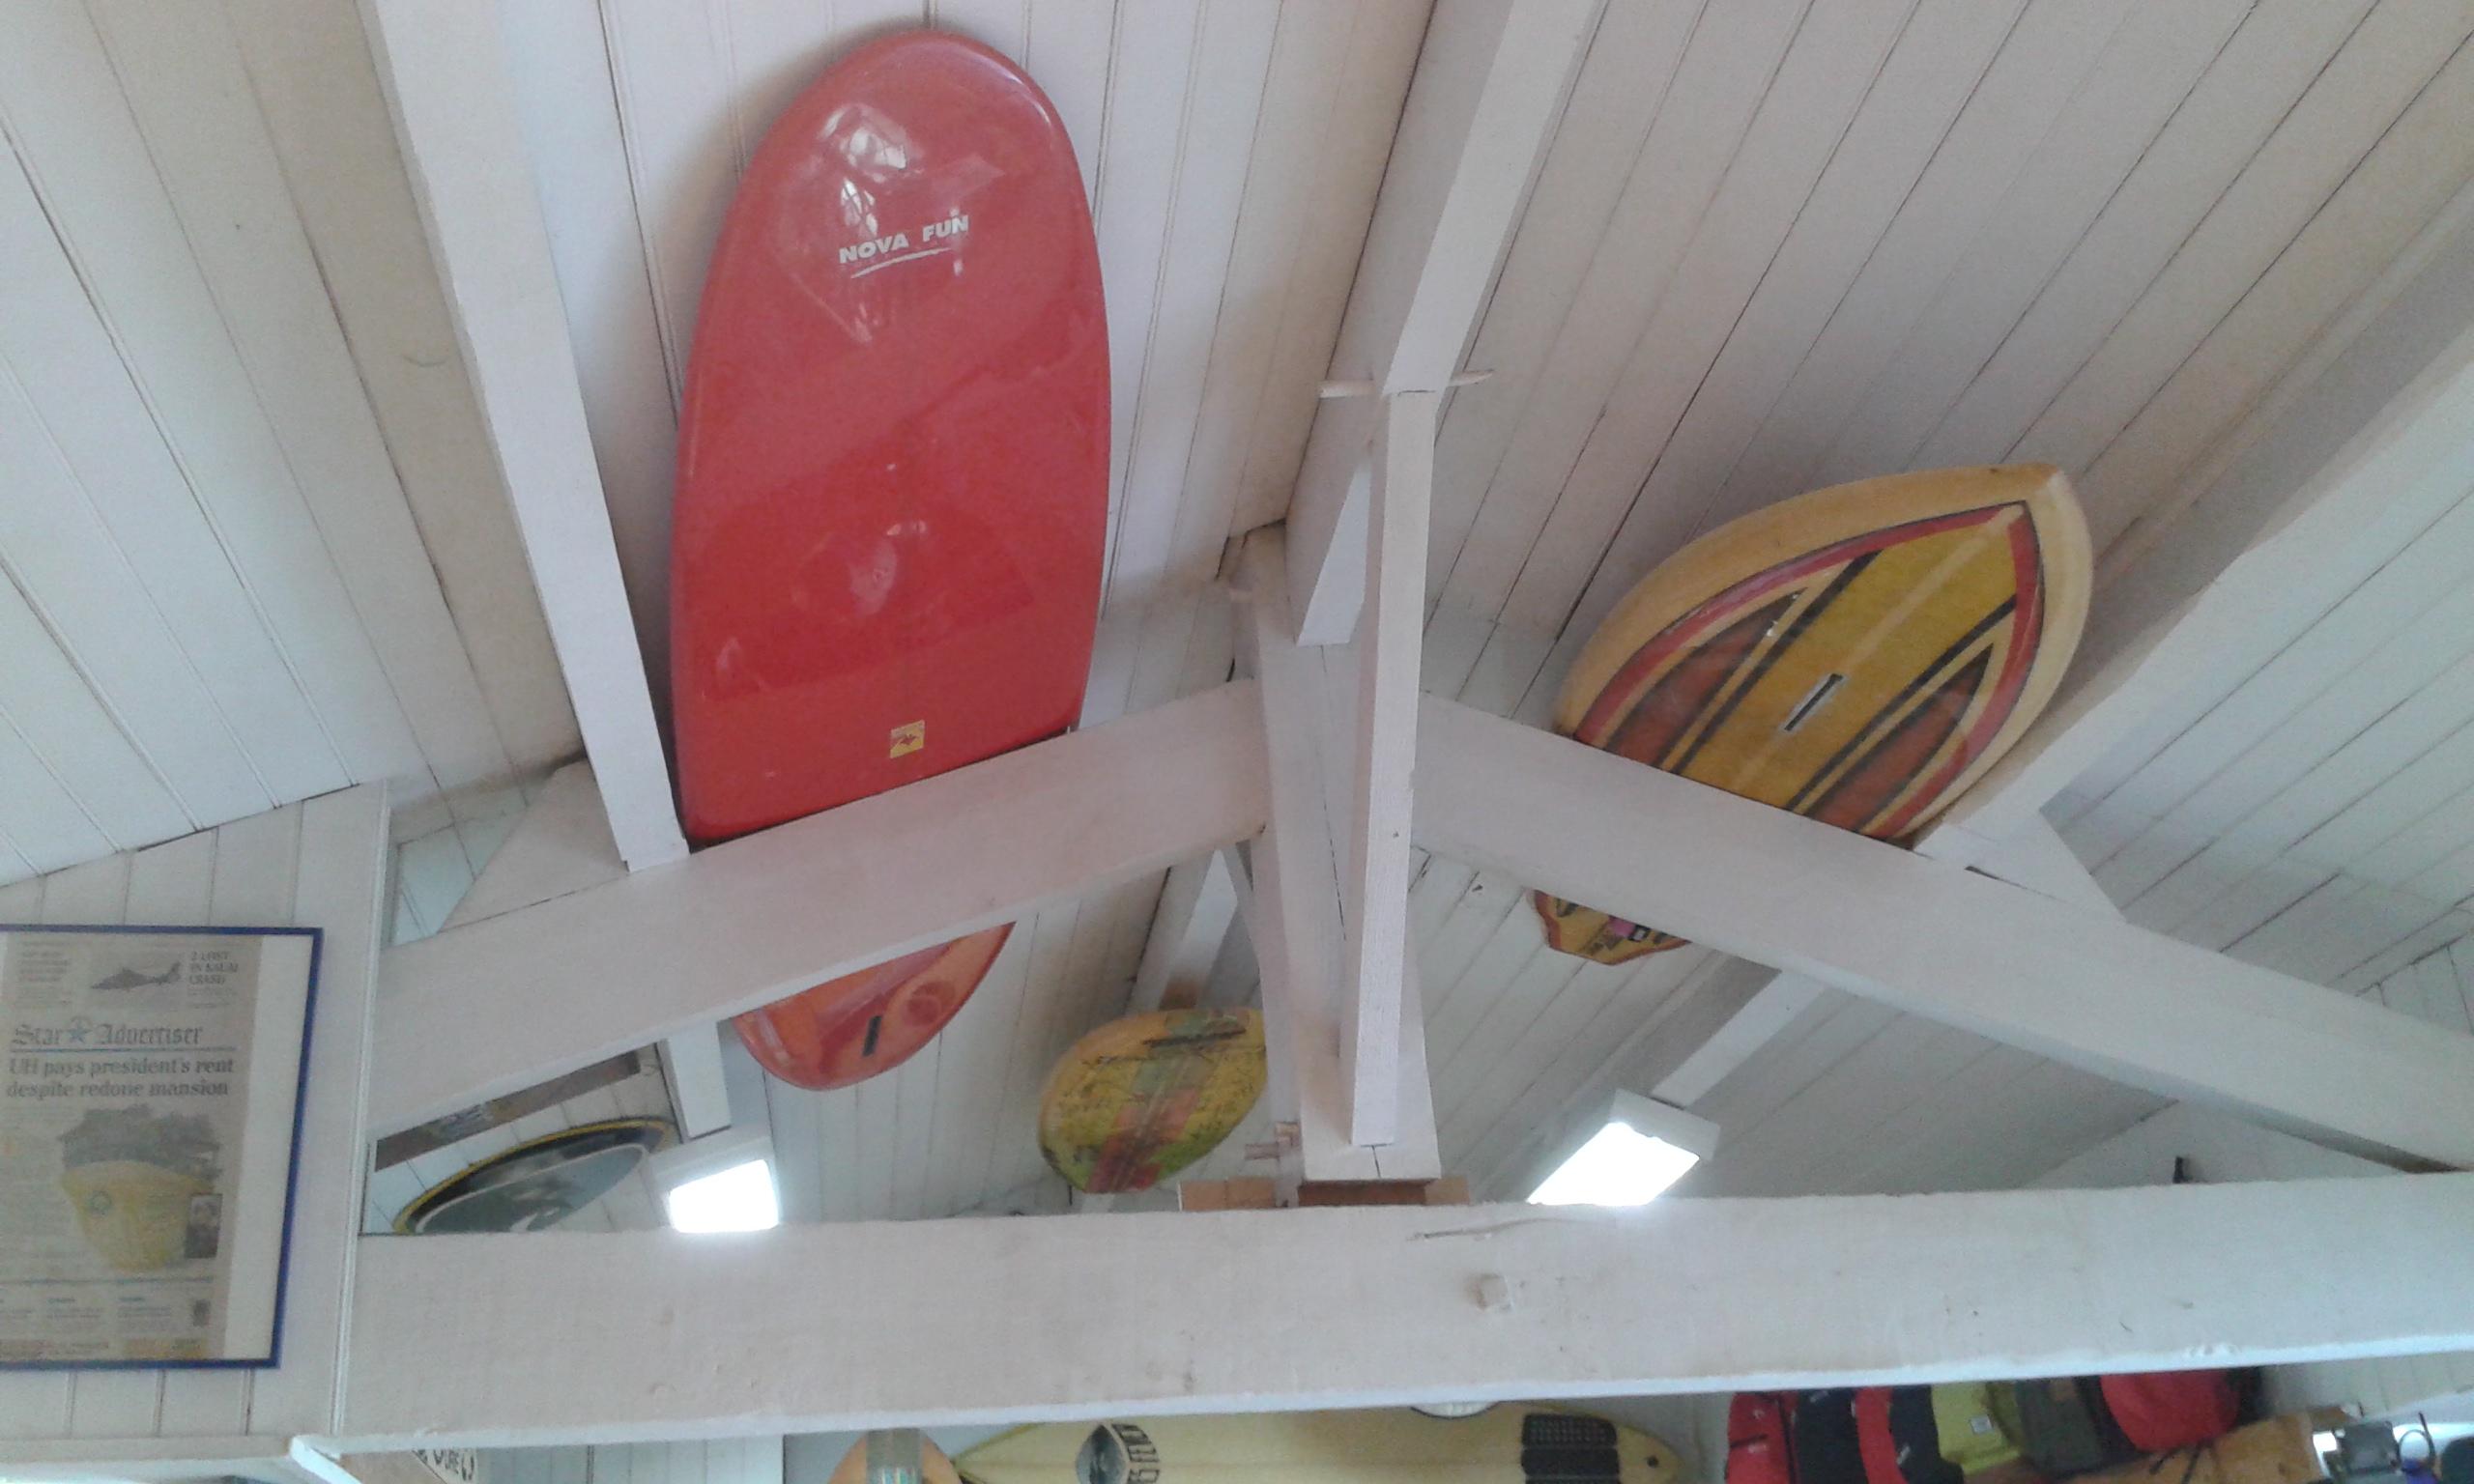 boards on the wall novafun